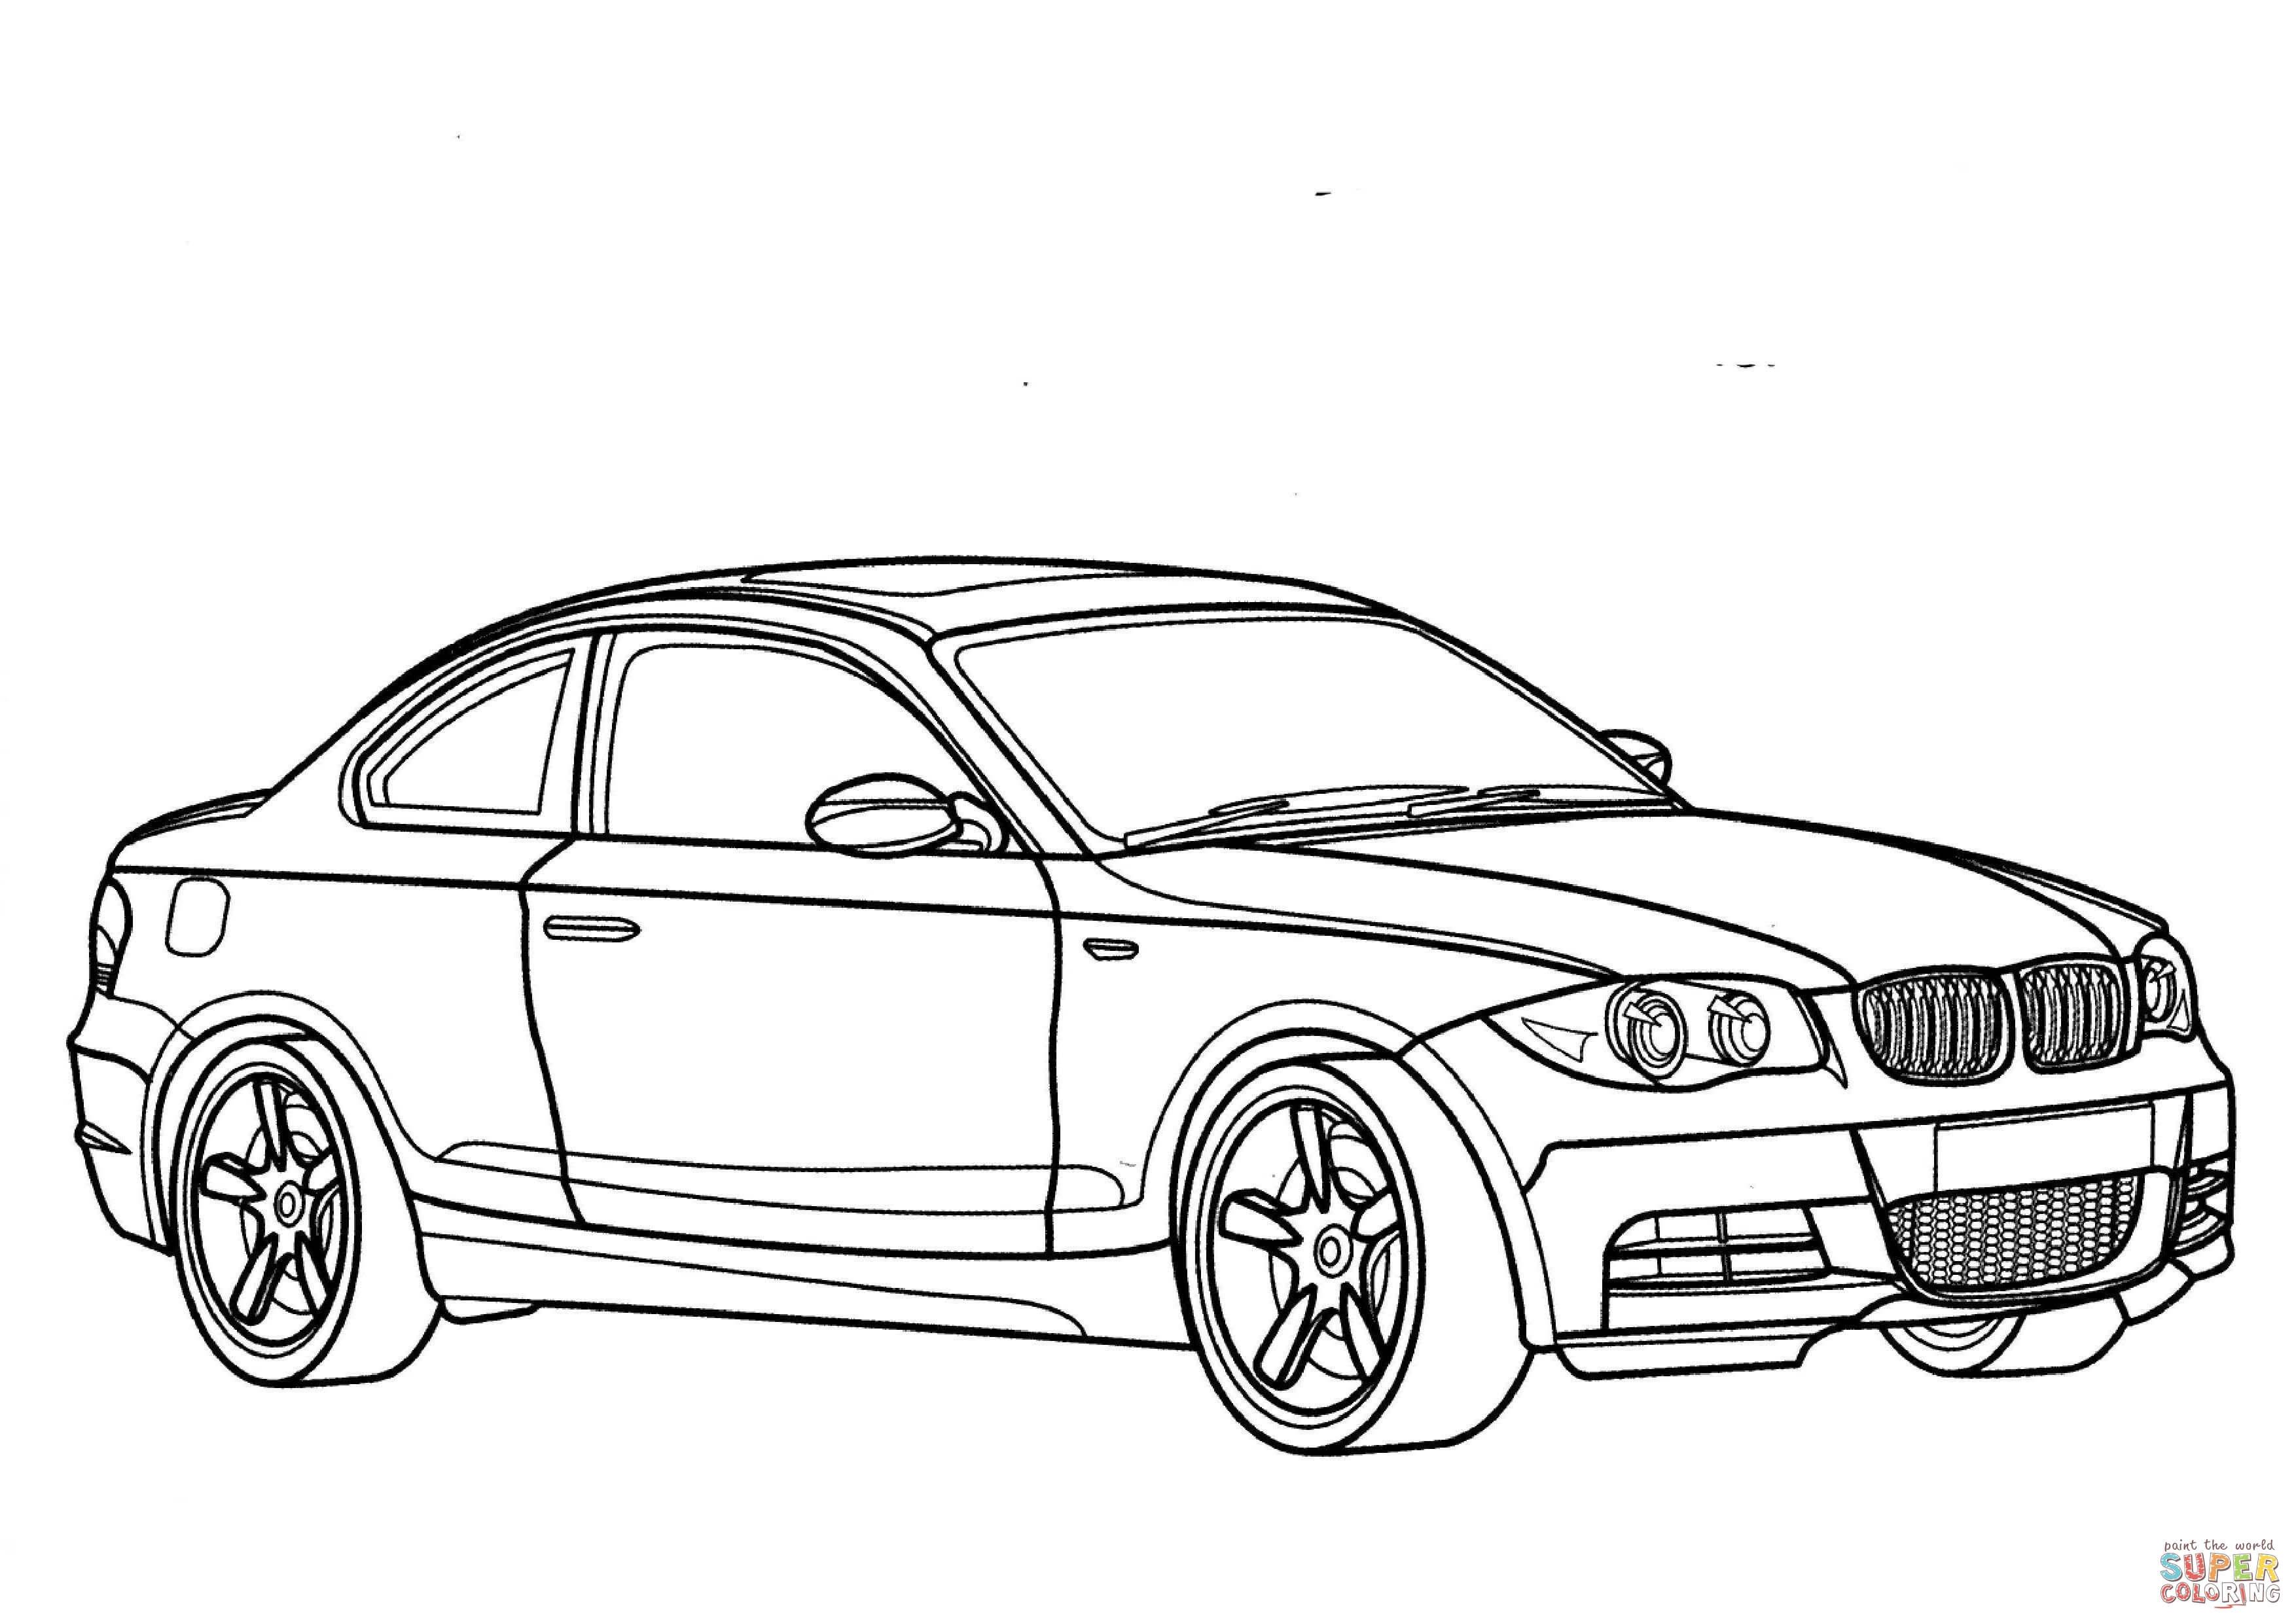 stanced bmw z3 coupe